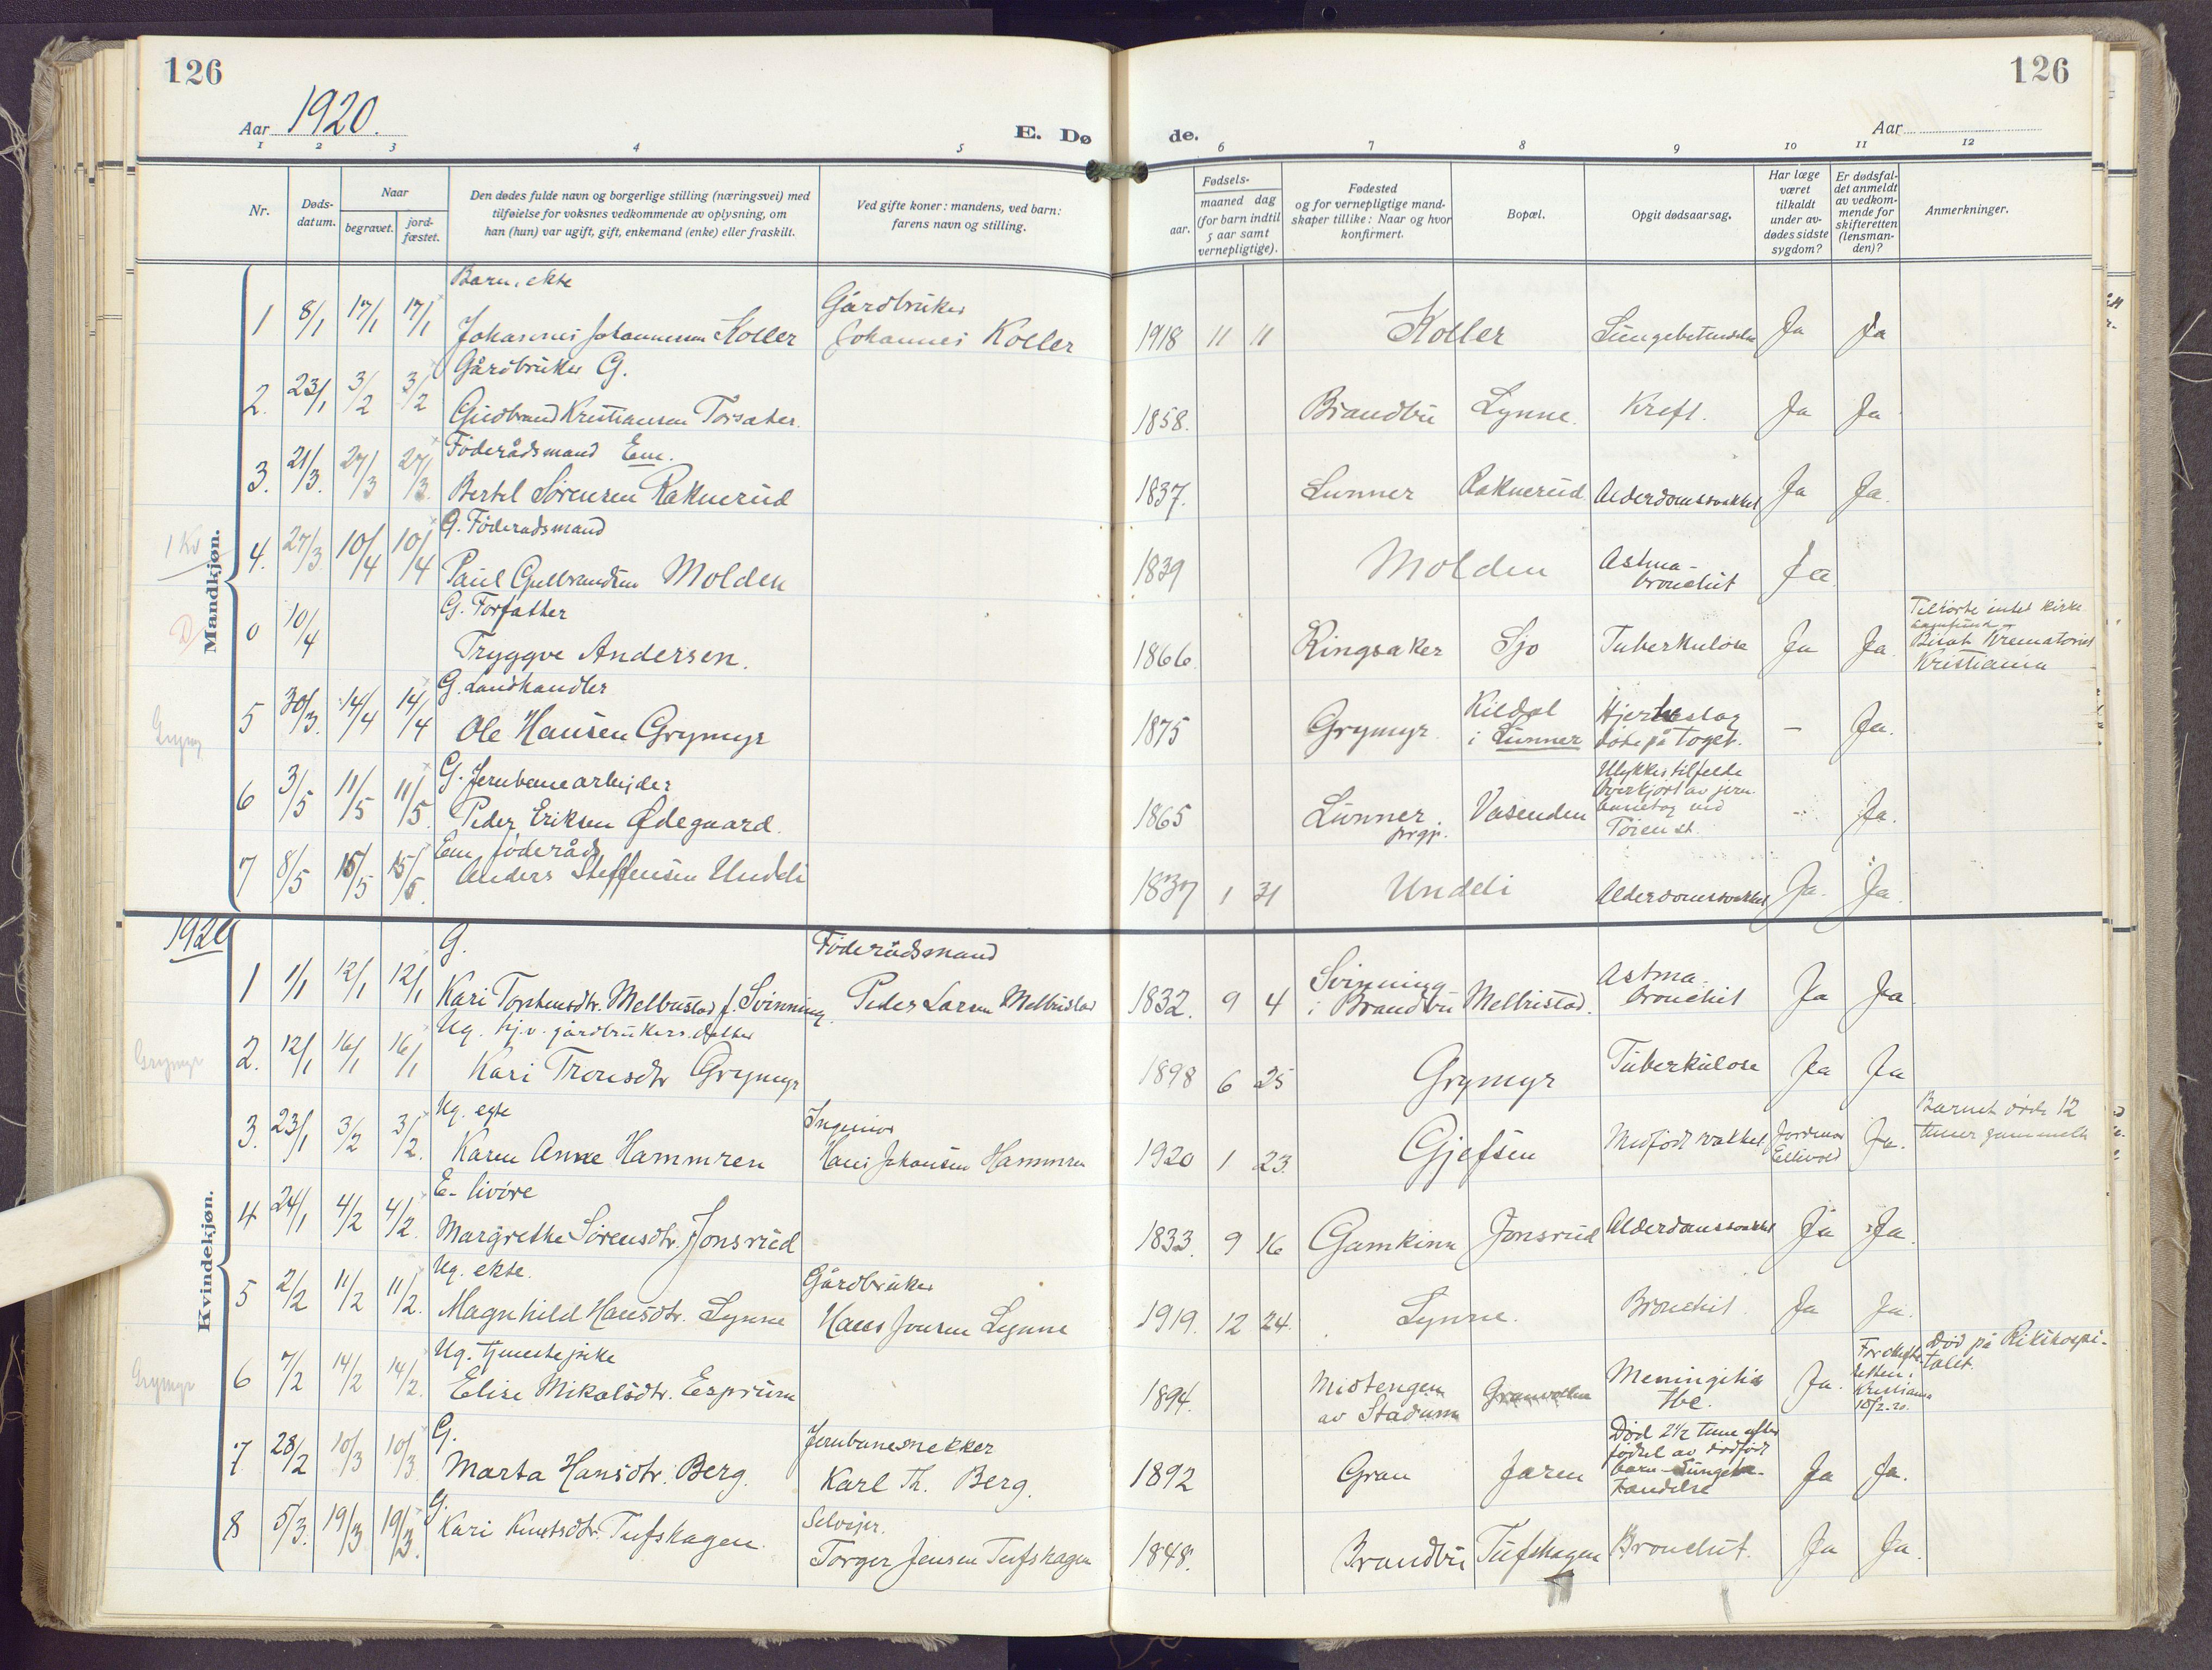 SAH, Gran prestekontor, Ministerialbok nr. 23, 1919-1938, s. 126